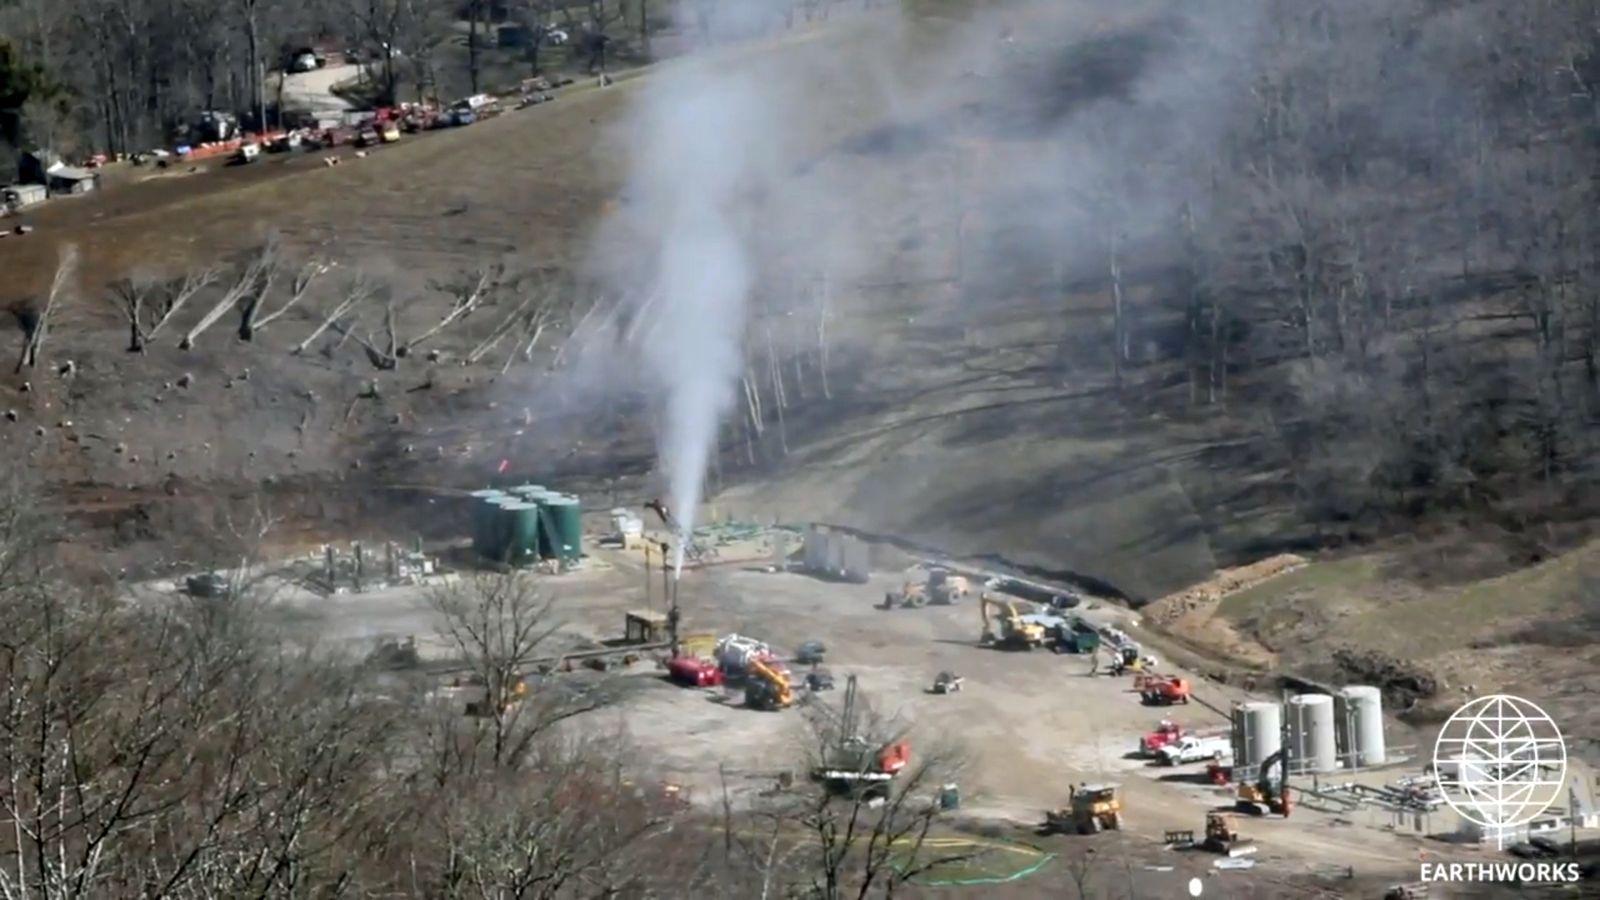 EINMALIGE VERWENDUNG Ohio/ Exxon/ Methan